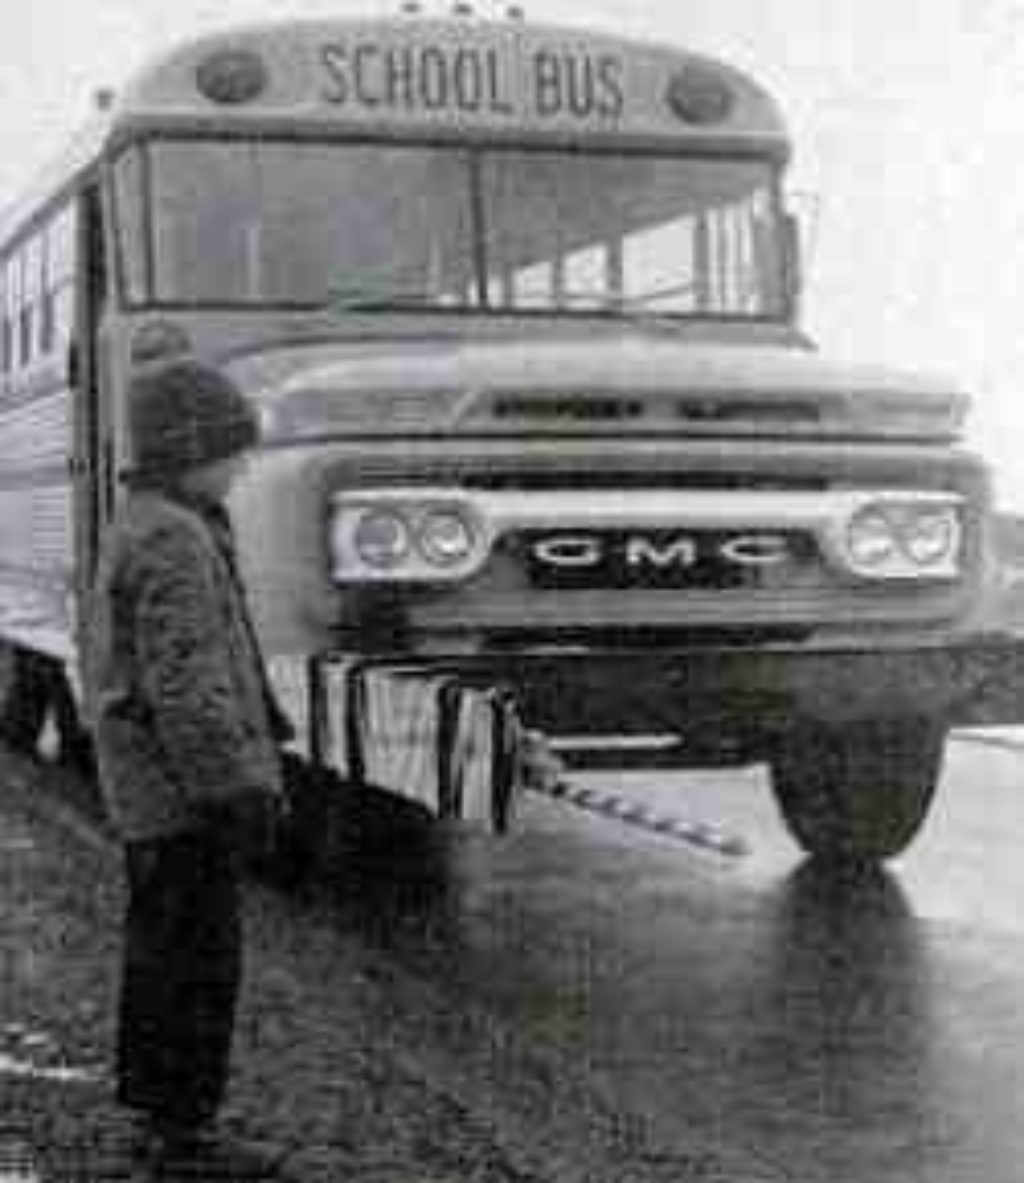 crossing gate on school bus